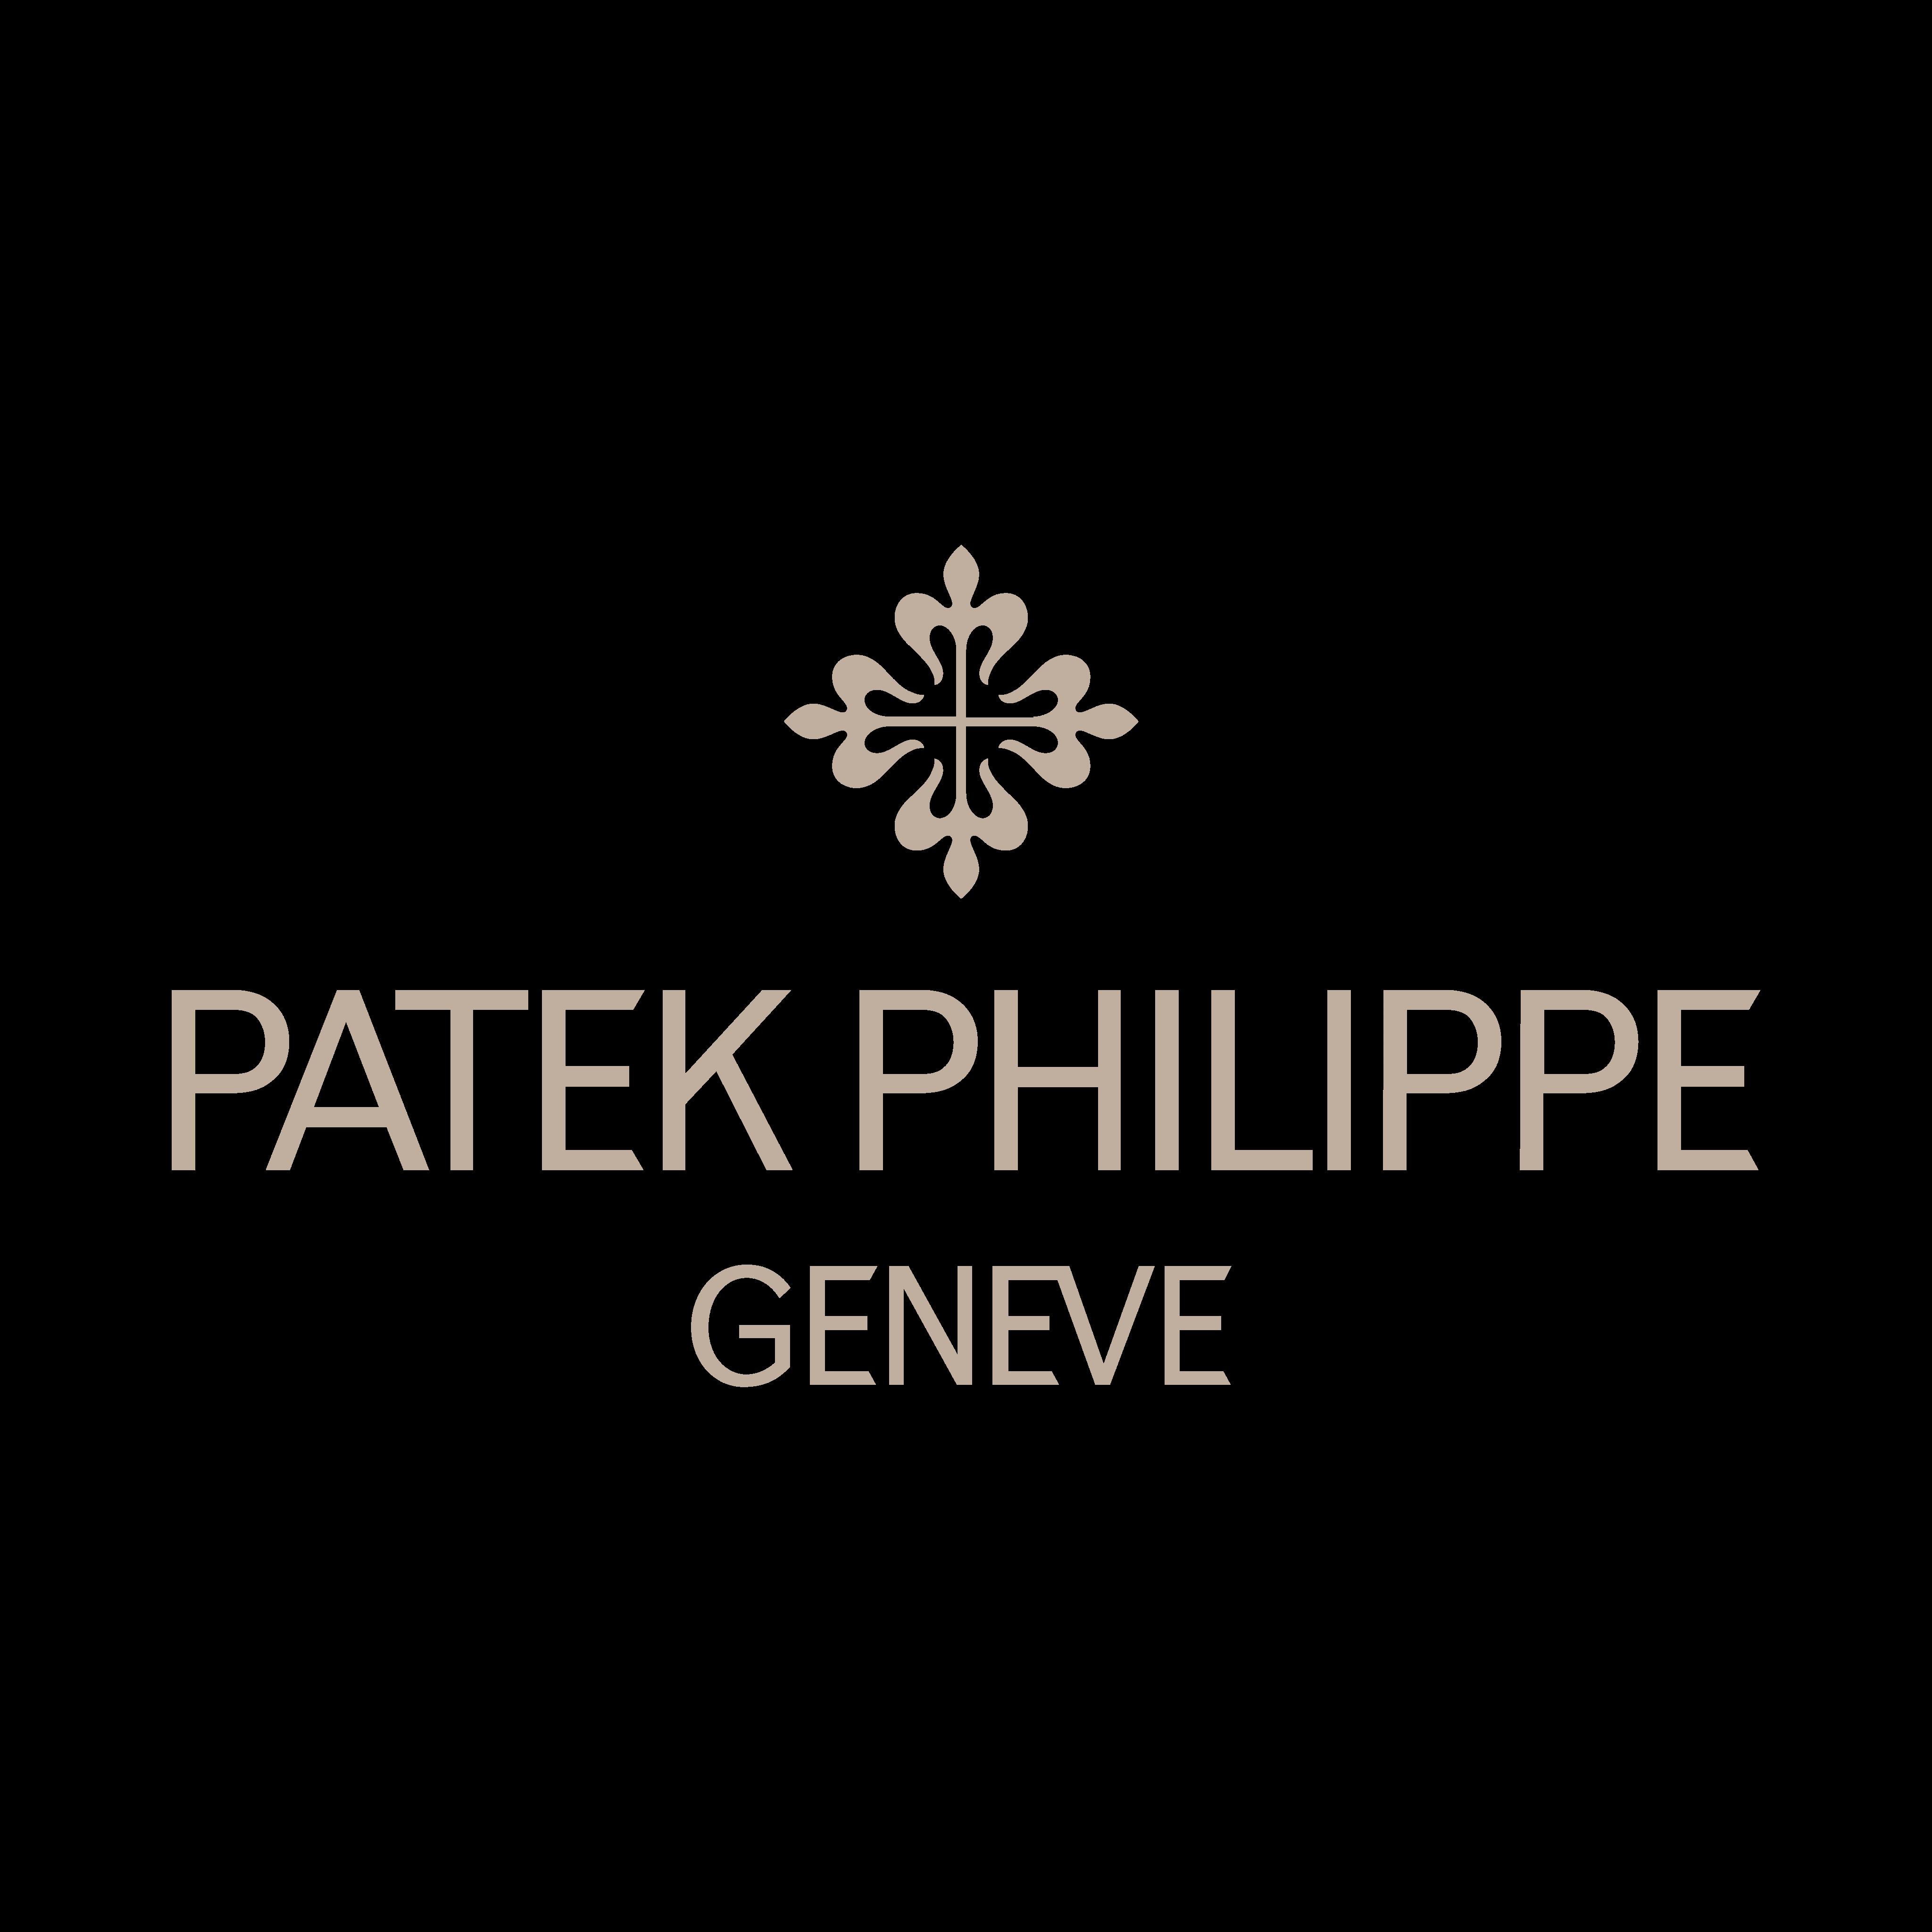 patek philippe logo 0 - Patek Philippe Logo